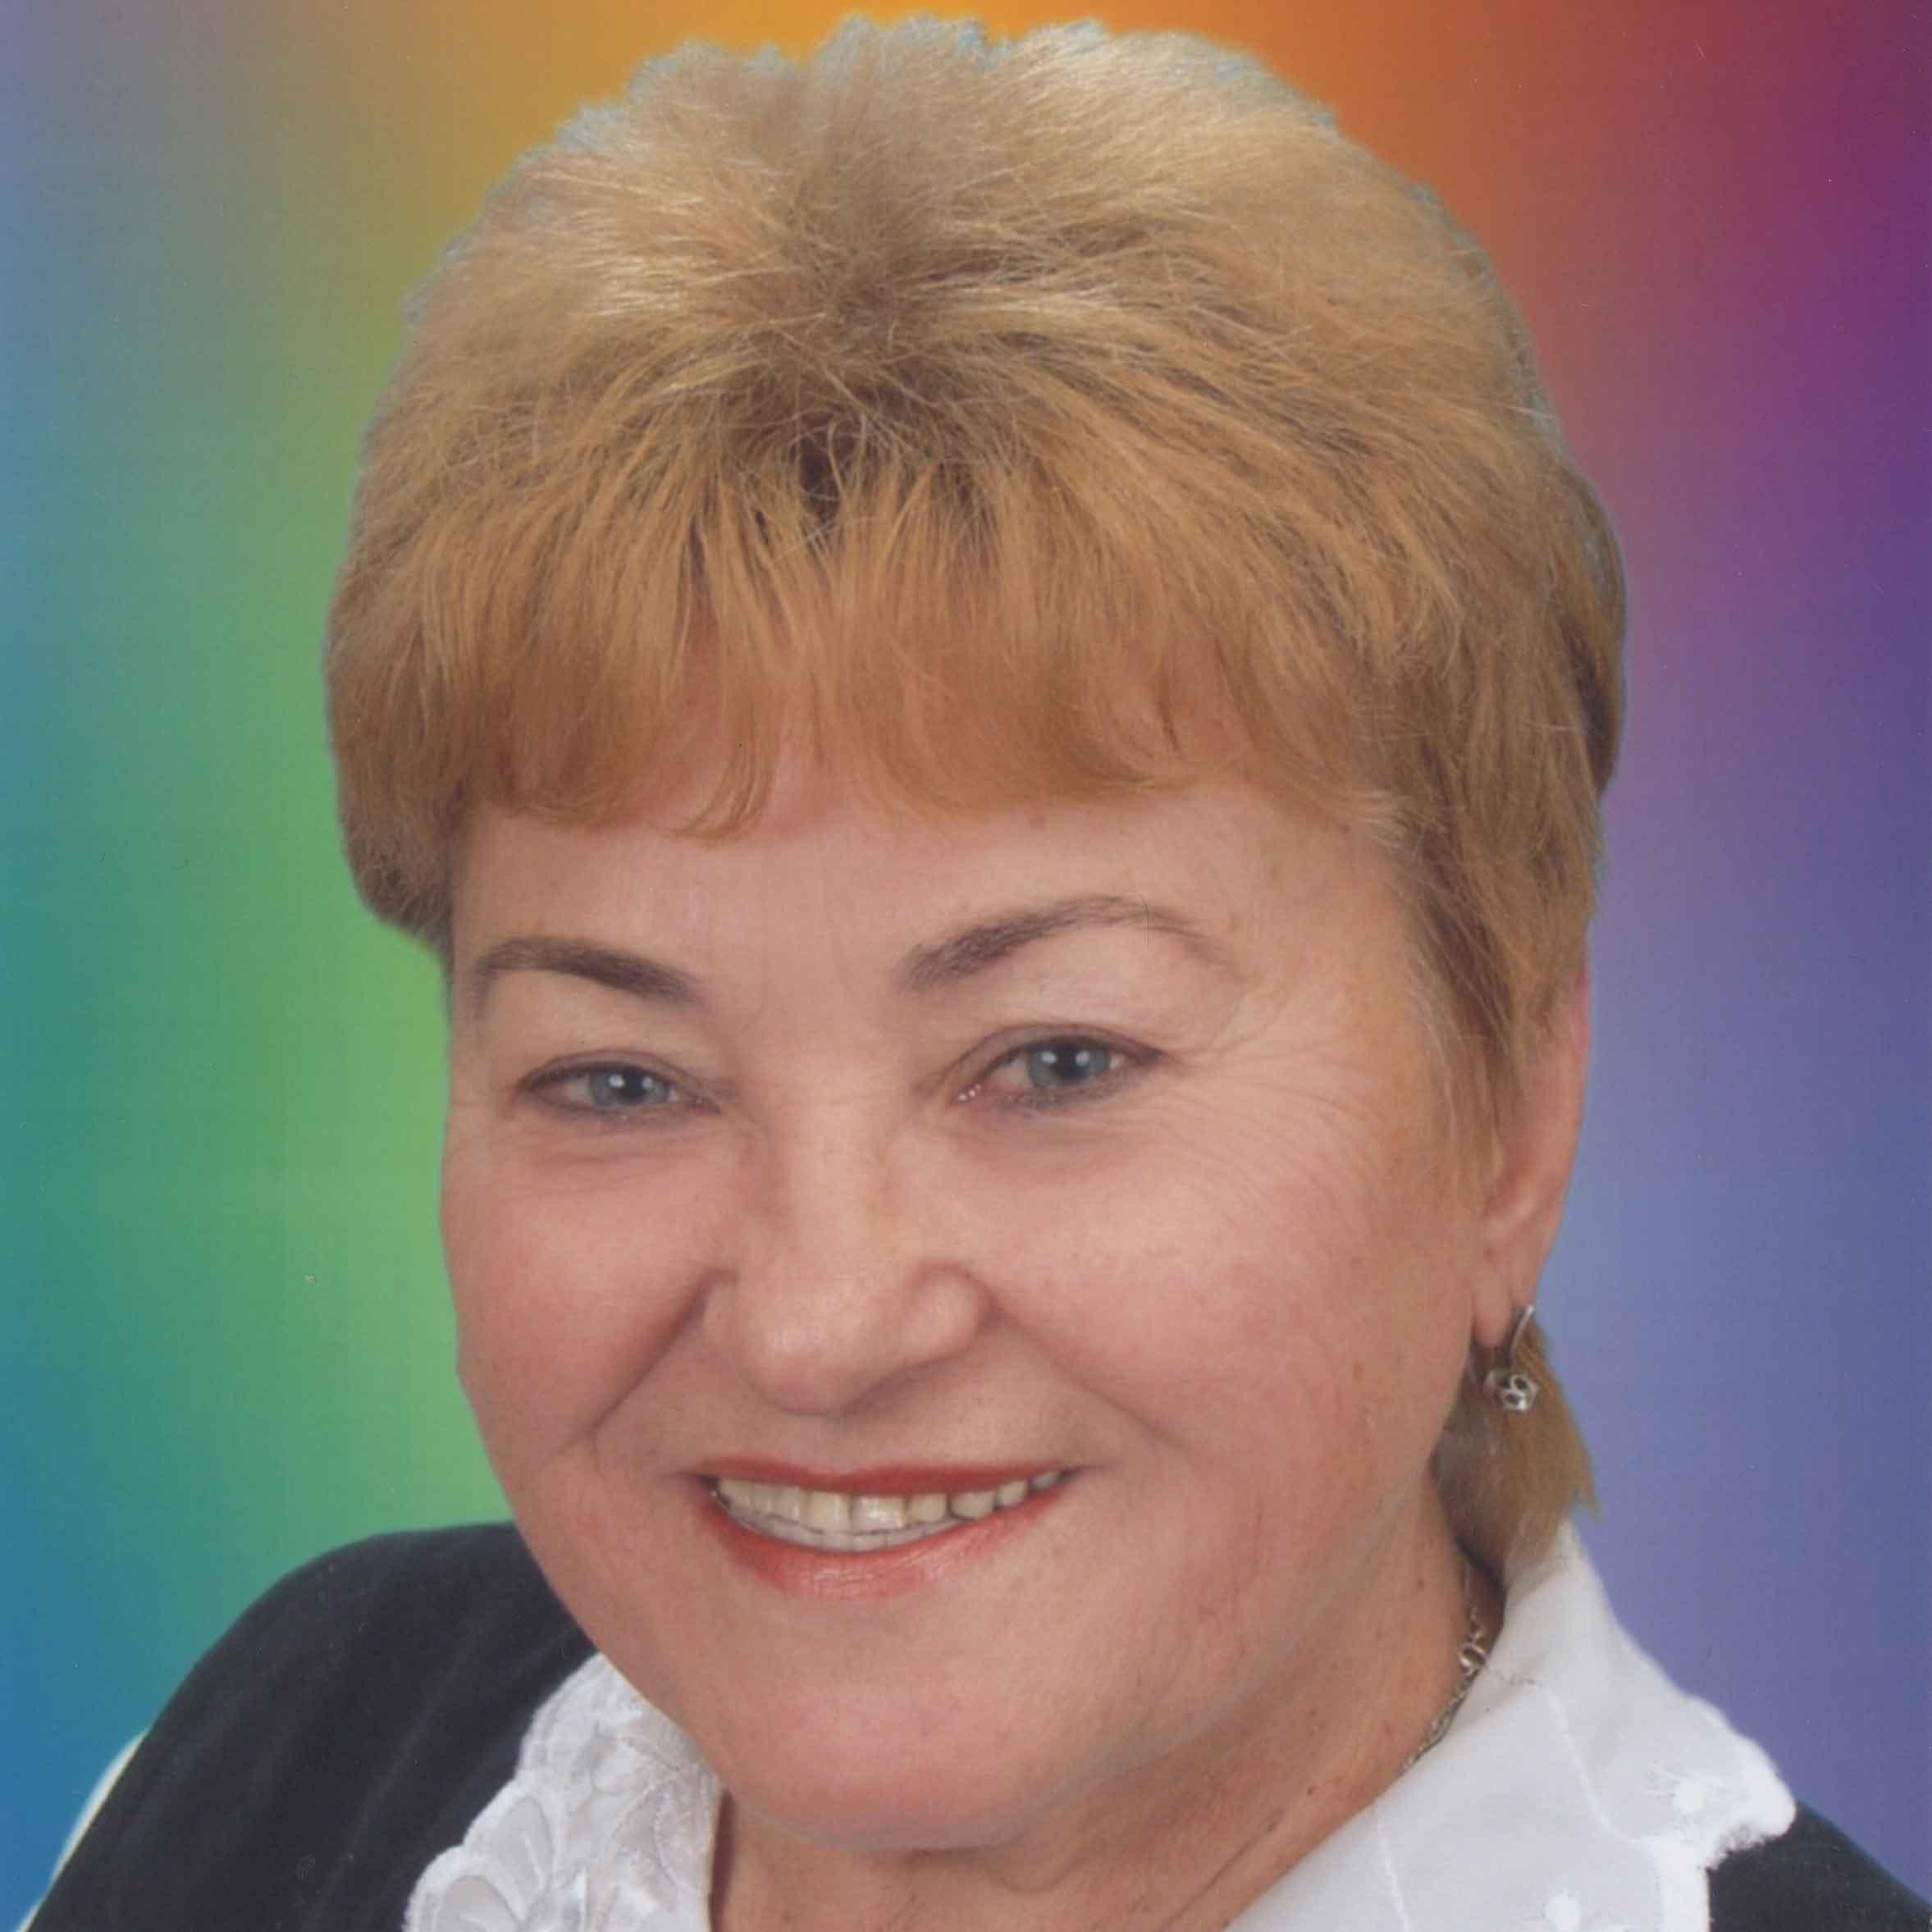 Савчик Маргарита Николаевна